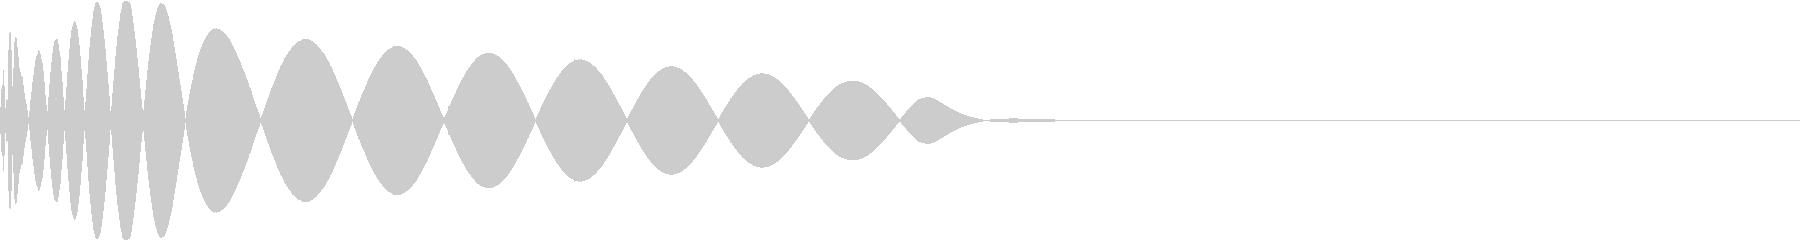 DTM Kick 41 オリジナル音源の未再生の波形